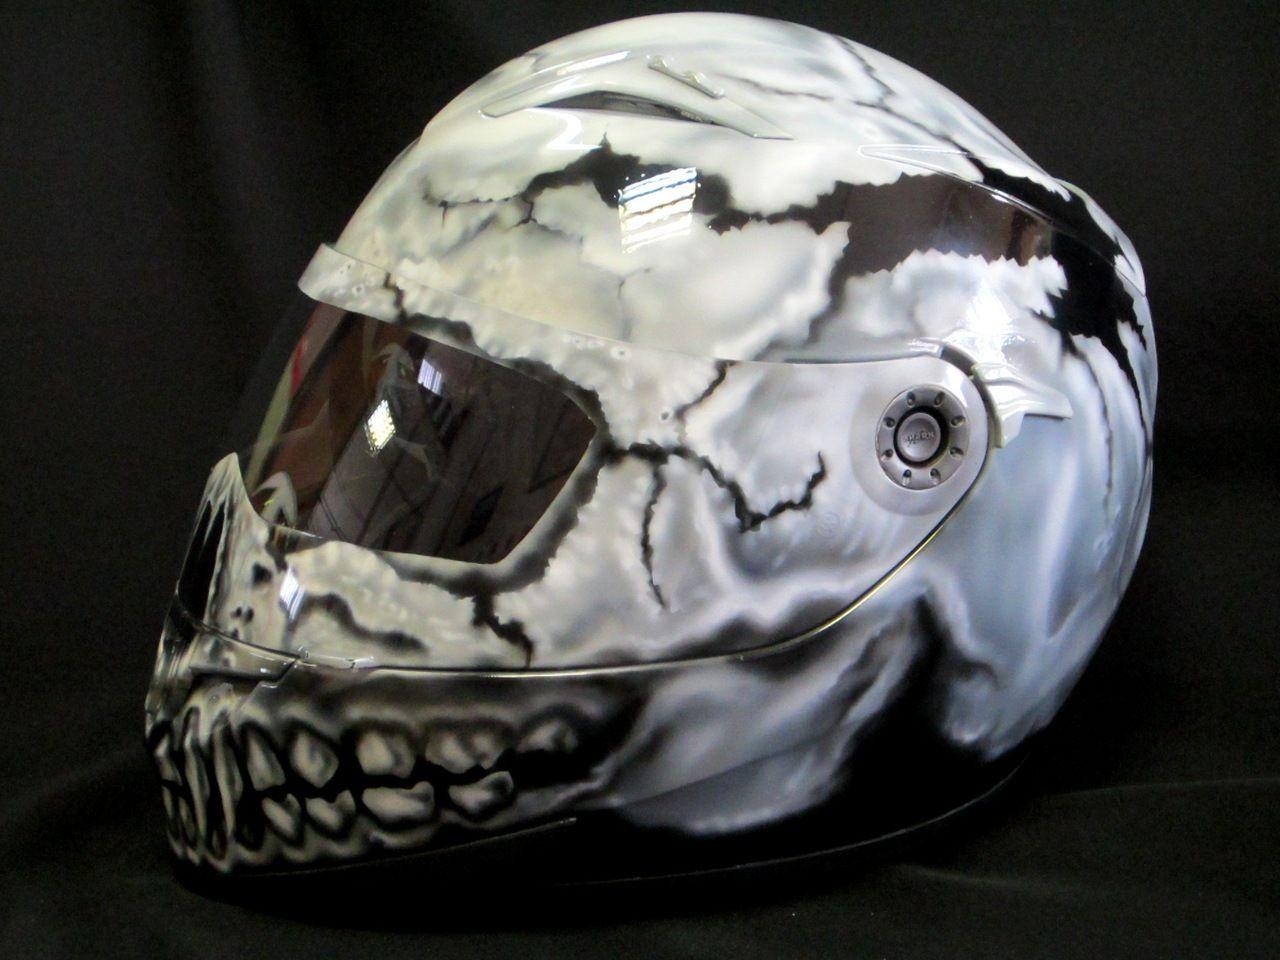 238adc876 Аэрография мотошлема Real Skull | Шлем | Шлем og Пинстрайпинг